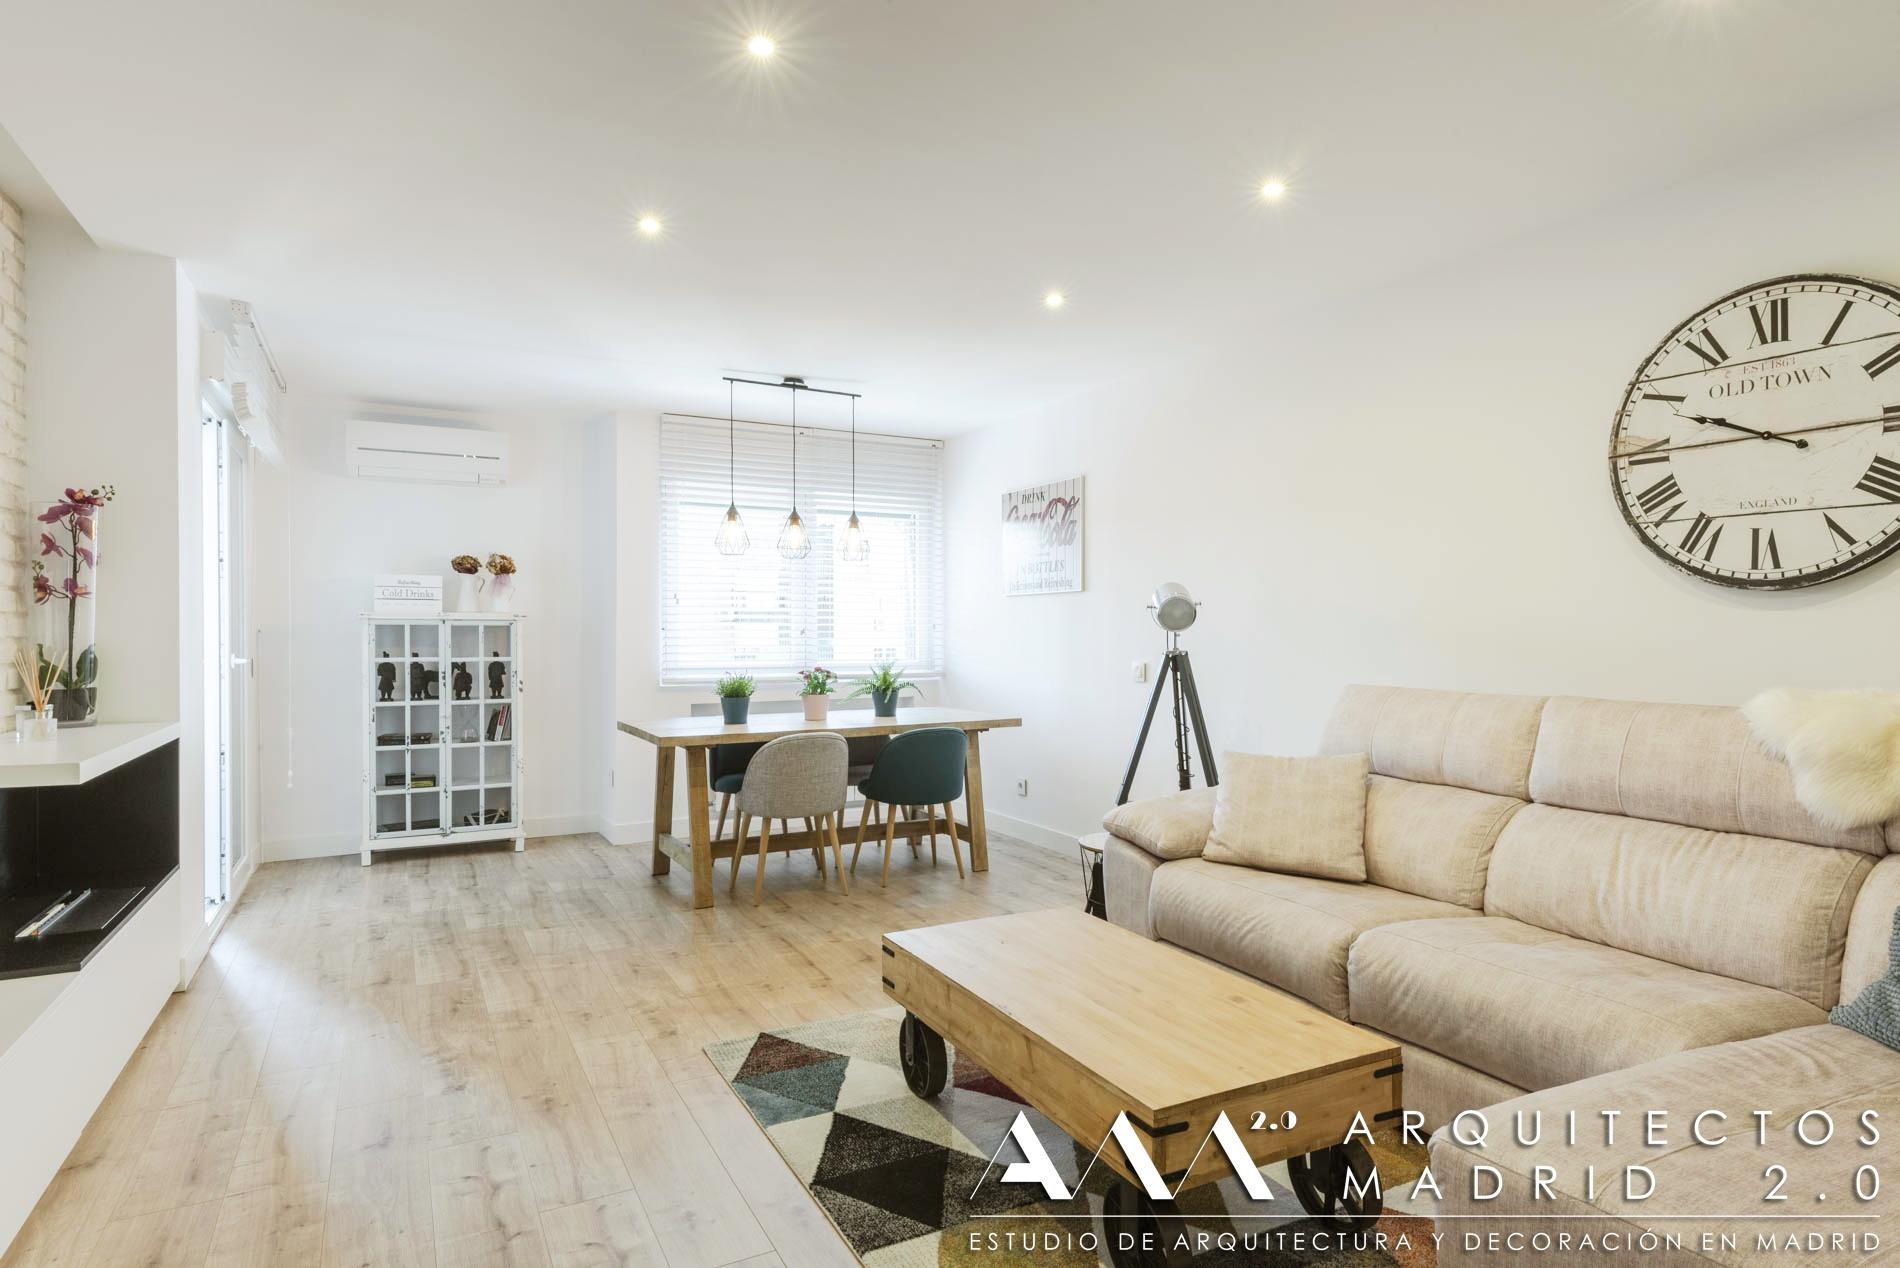 reforma-vivienda-housing-reform-architects-design-by-arquitectos-madrid-04